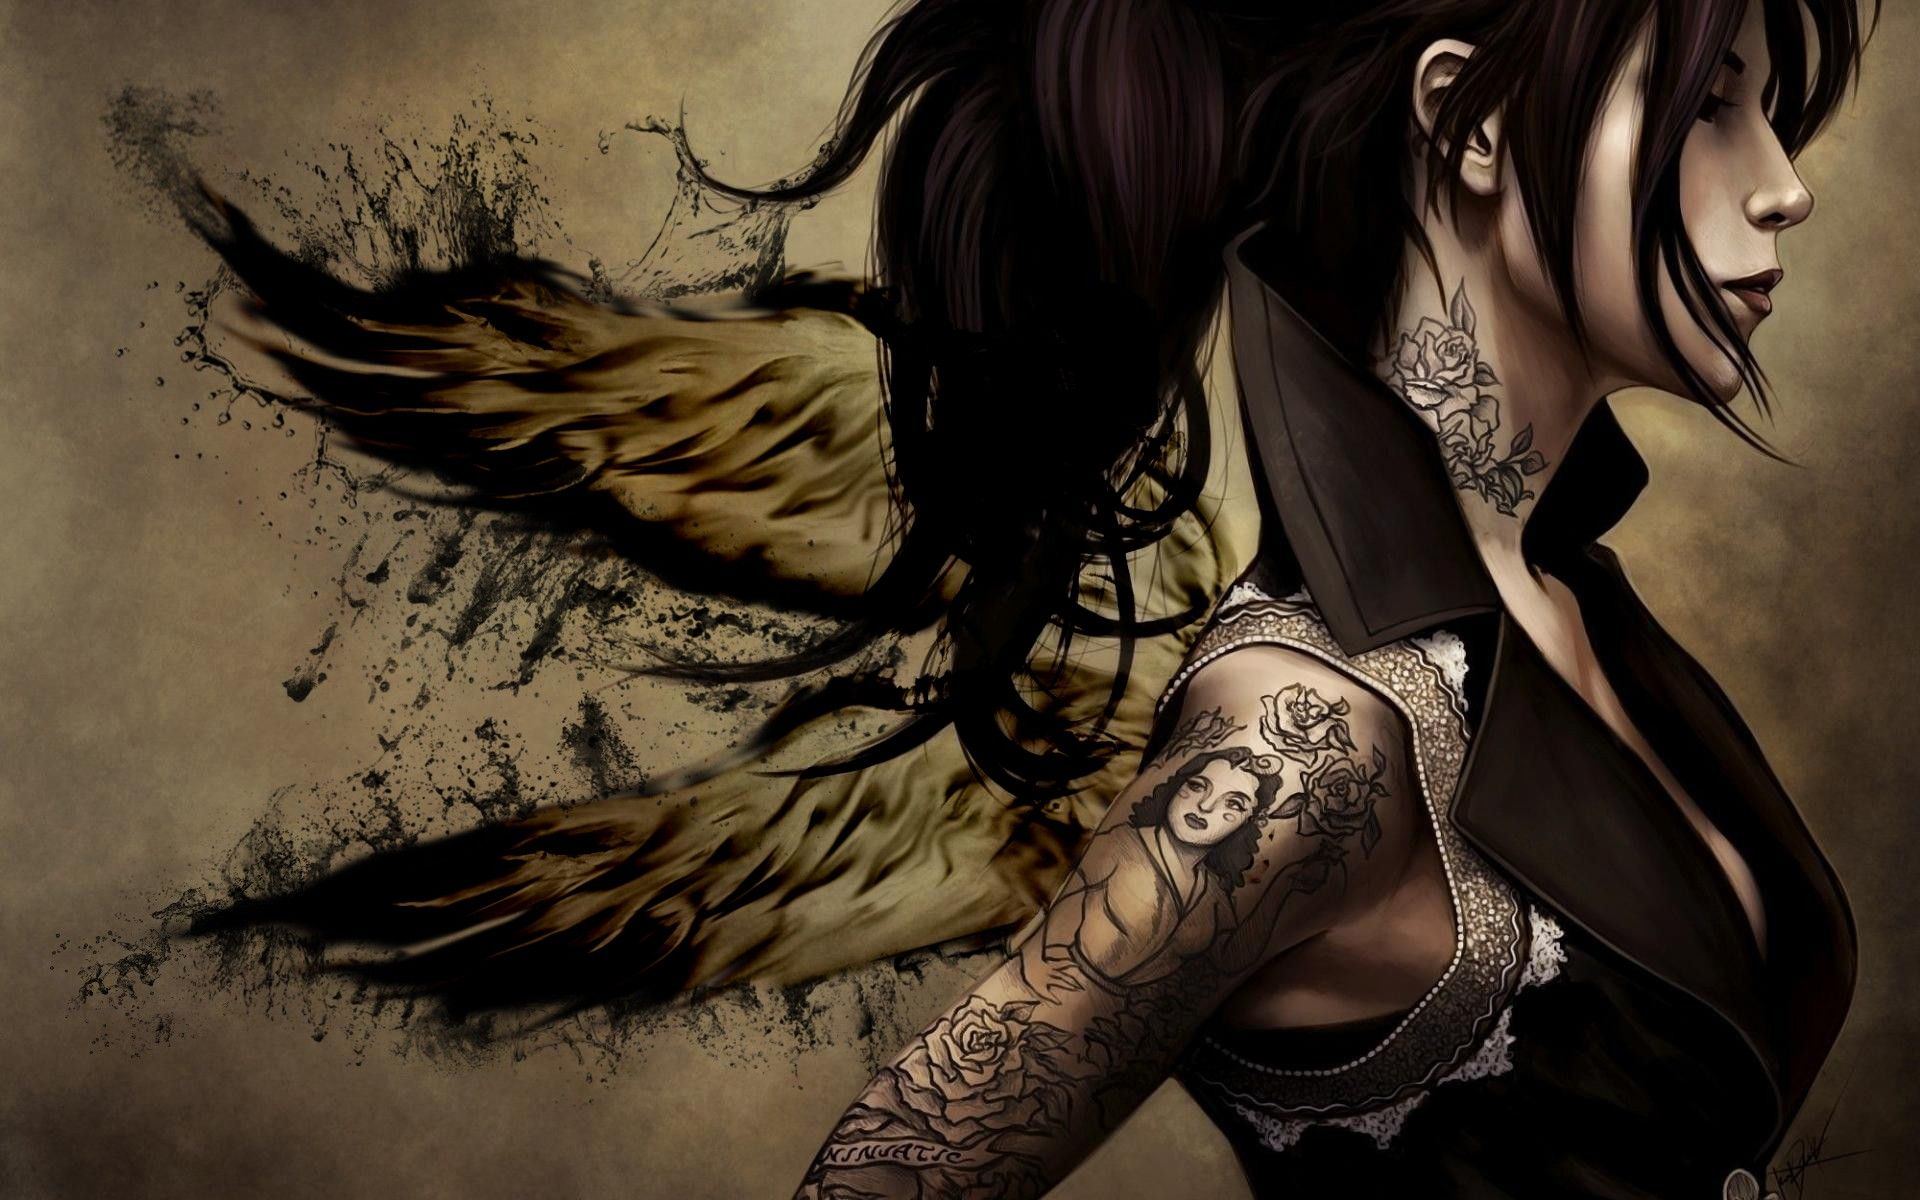 Pin By Roxy Smith On Art Photography Tattoo Girl Wallpaper Fantasy Tattoos Girl Tattoos Tattoo wallpaper full hd